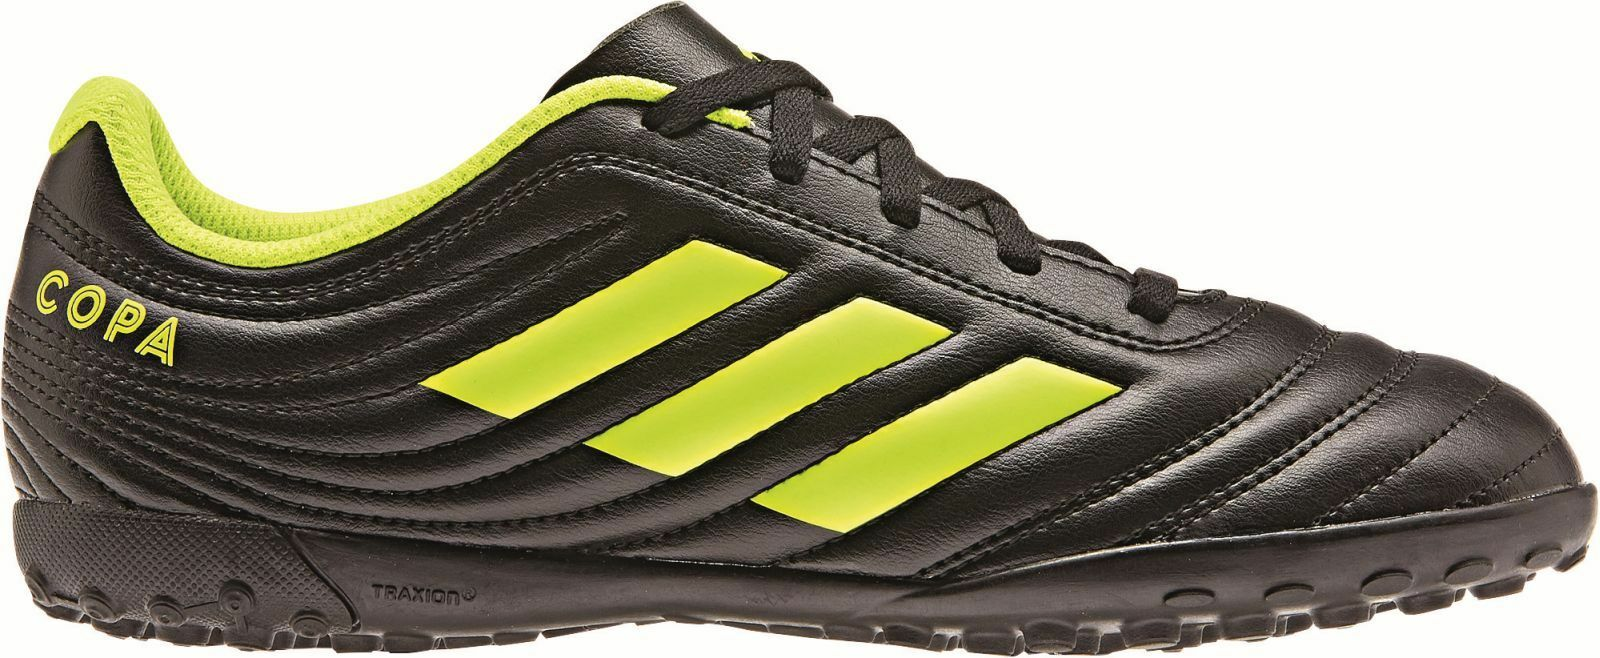 Adidas Performance Bambini Tacchetti 19.4 Tf J black-yellow Scarpa Copa  nynula9914-Shoes   Cleats 2542c0ae19e